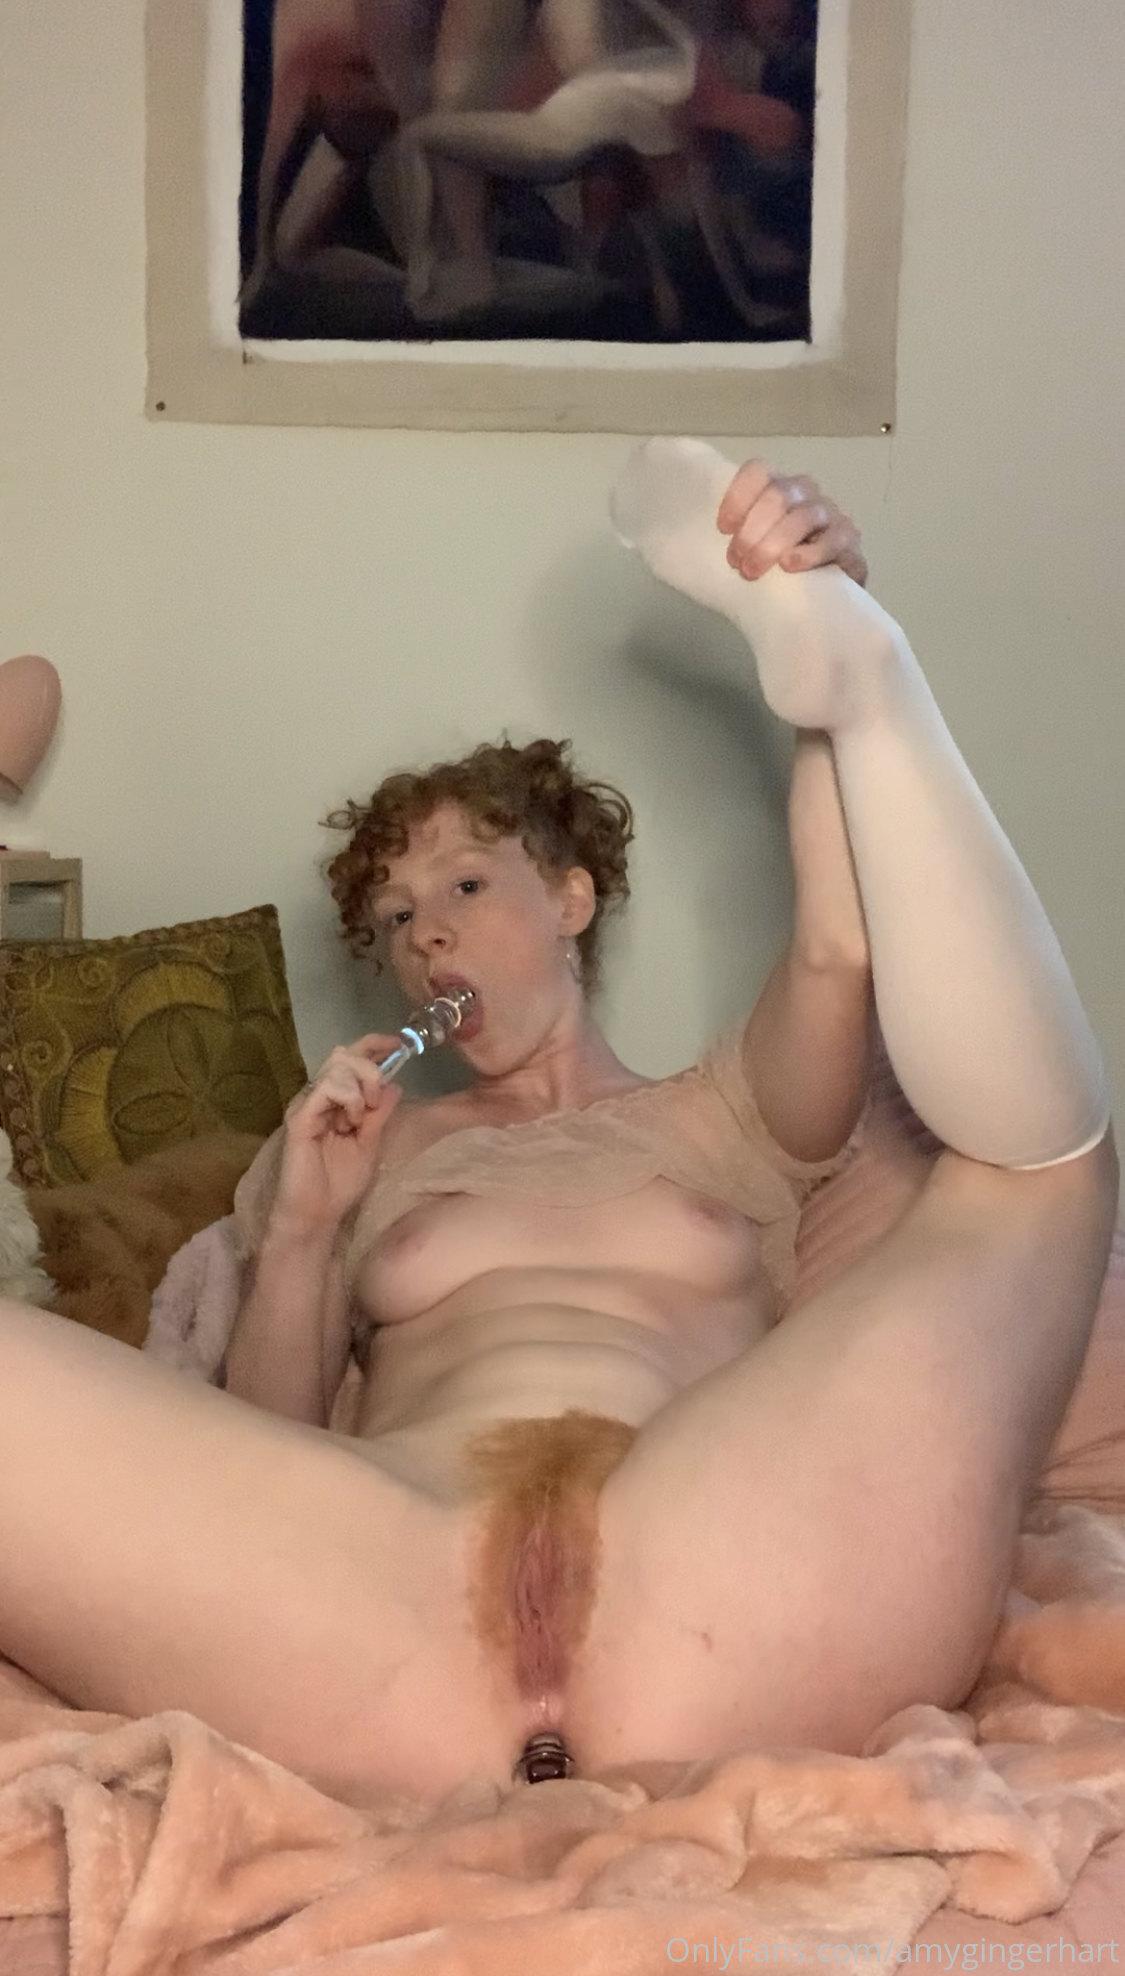 Amy Hart, Amygingerhart, Onlyfans 0175